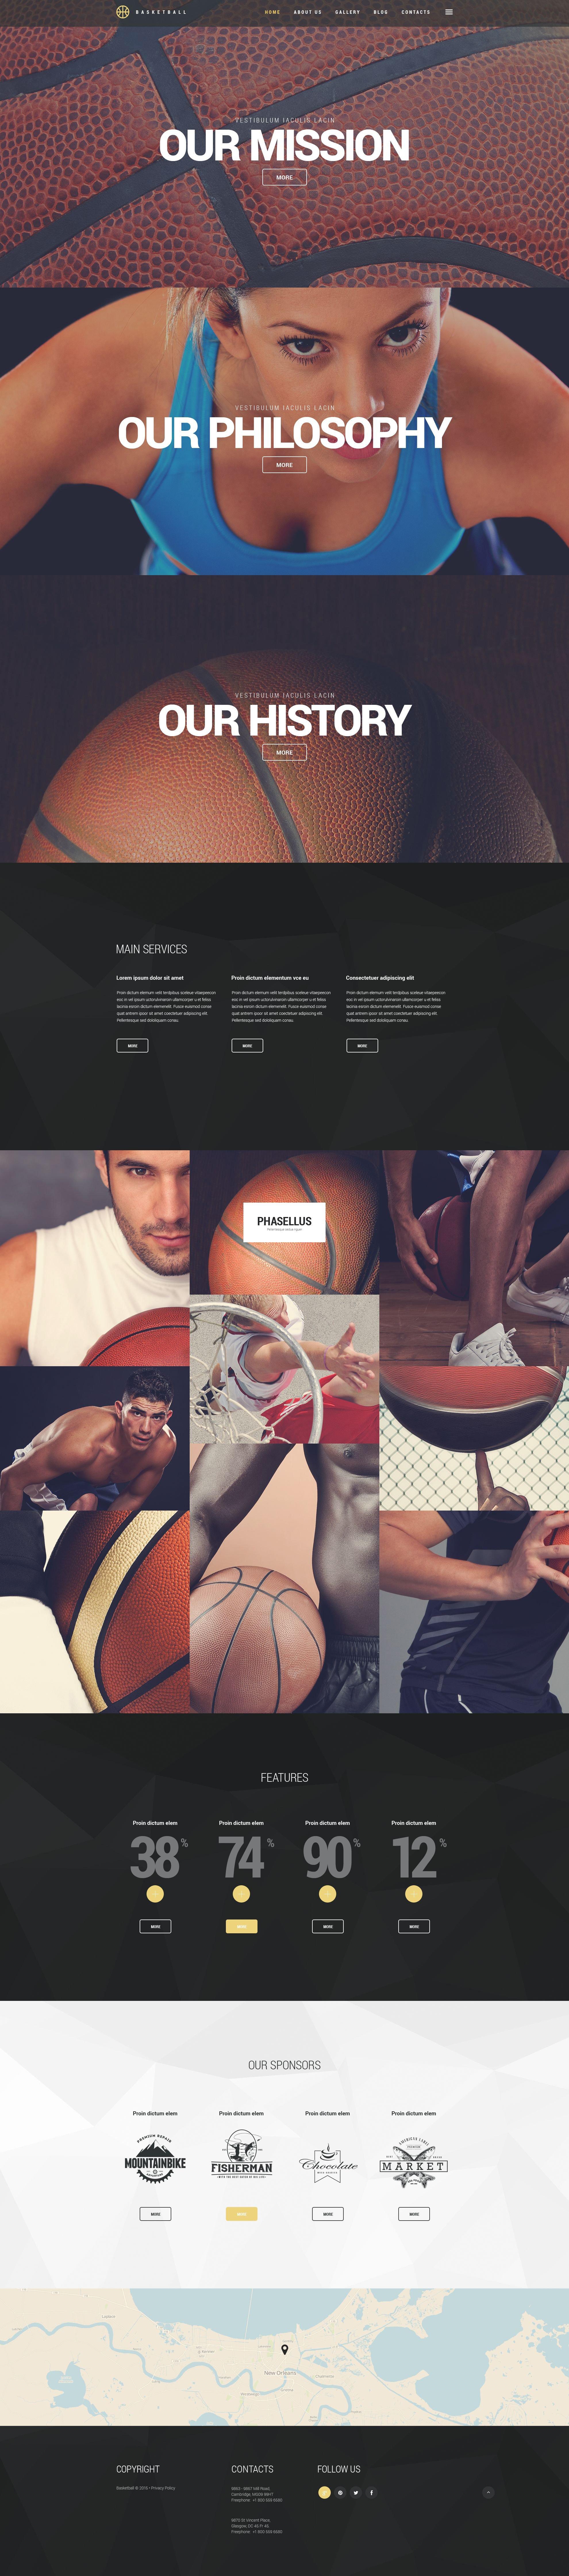 Responsive Basketball Jam Wordpress #54731